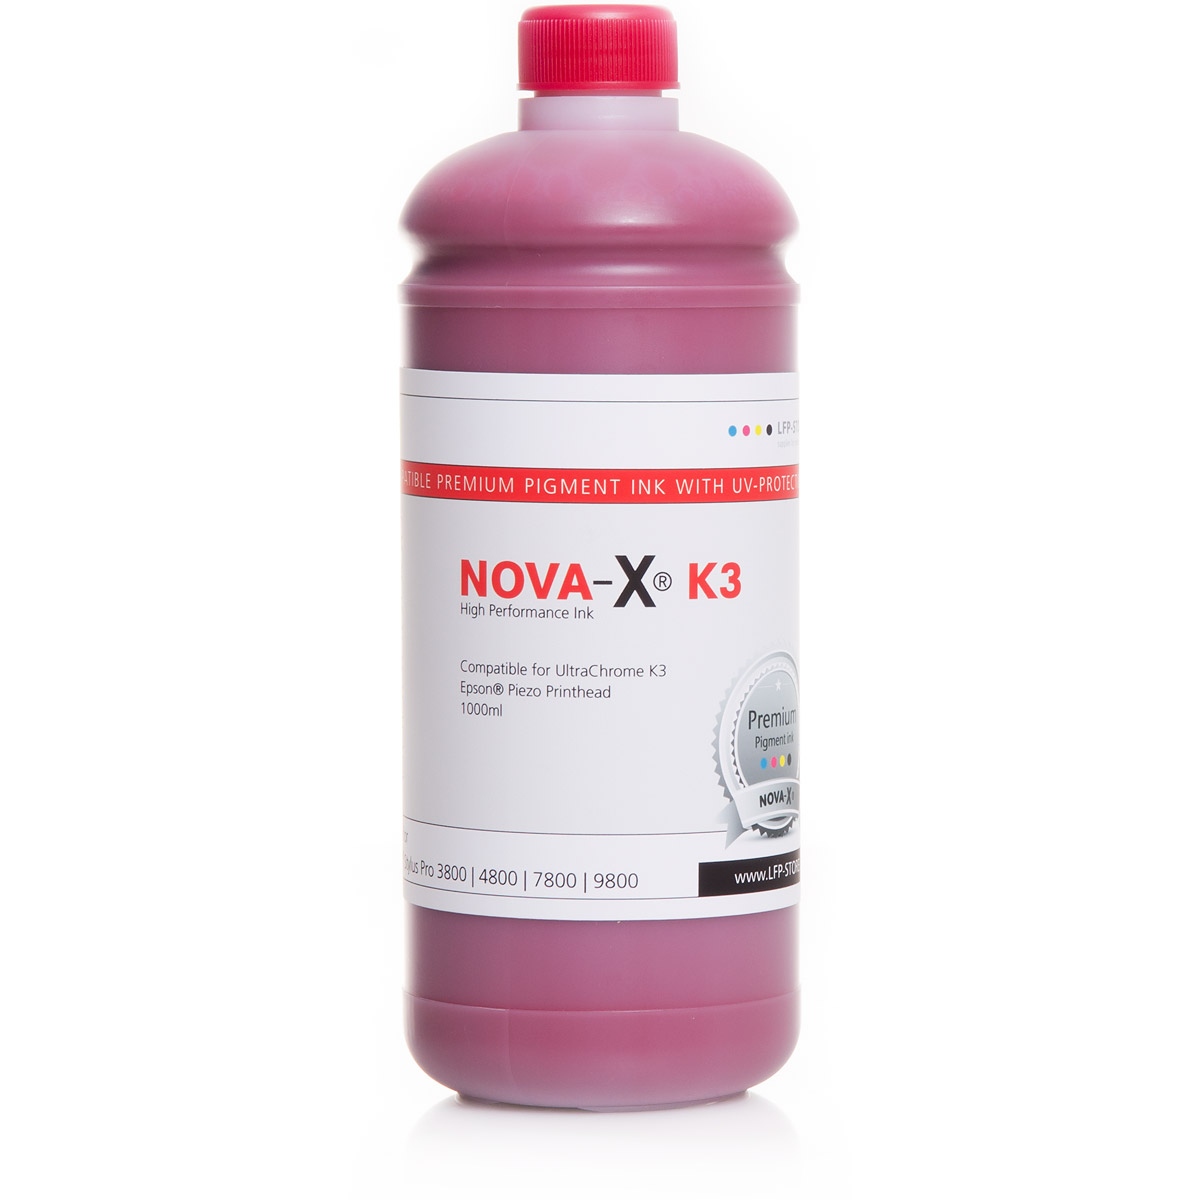 1L NOVA-X® K3 Pigmenttinte kompatibel für Epson Stylus Pro 3800 4800 7800 9800